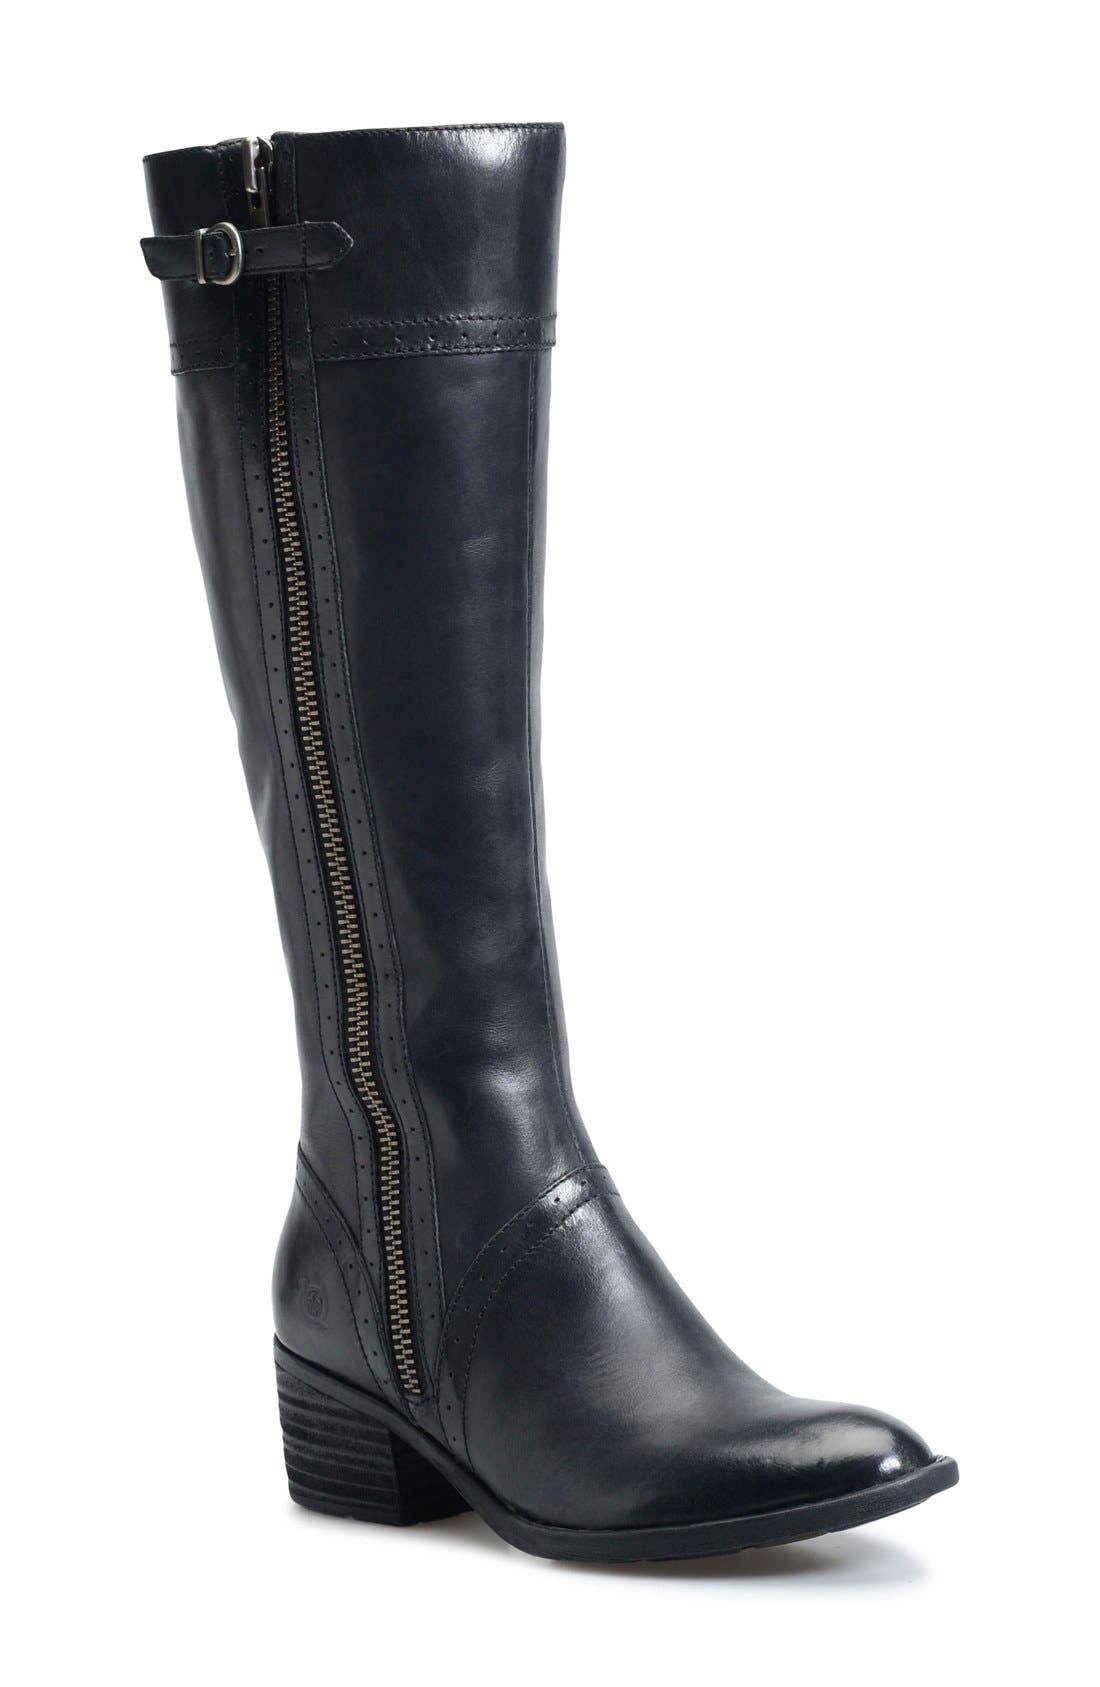 Alternate Image 1 Selected - Børn Poly Riding Boot (Women) (Regular & Wide Calf)